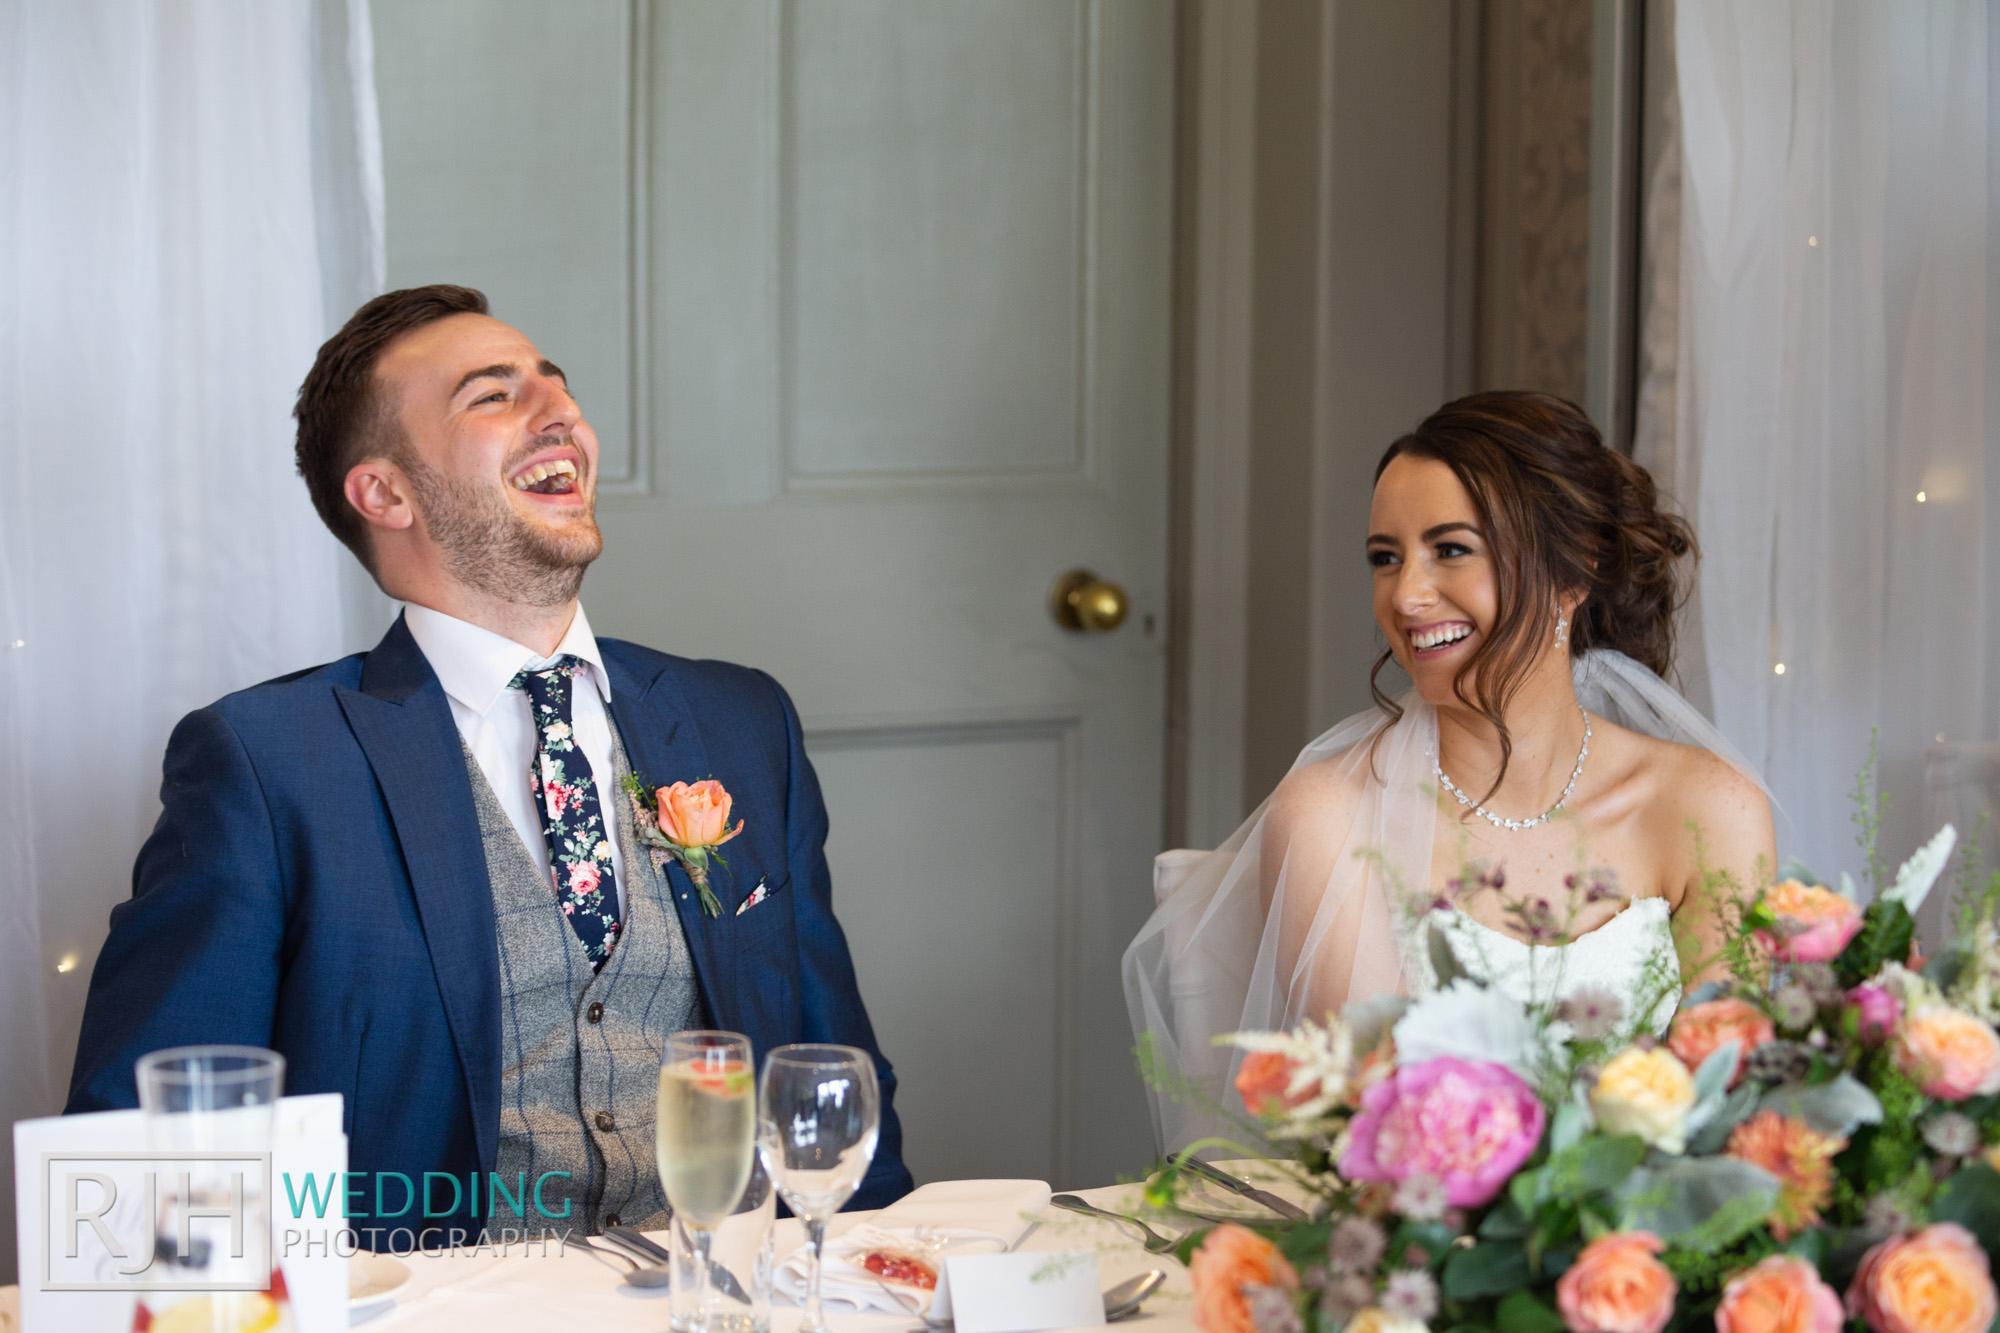 Whirlowbrook Hall Wedding Photography_Jack & Lydia_053_IMG_4502.jpg